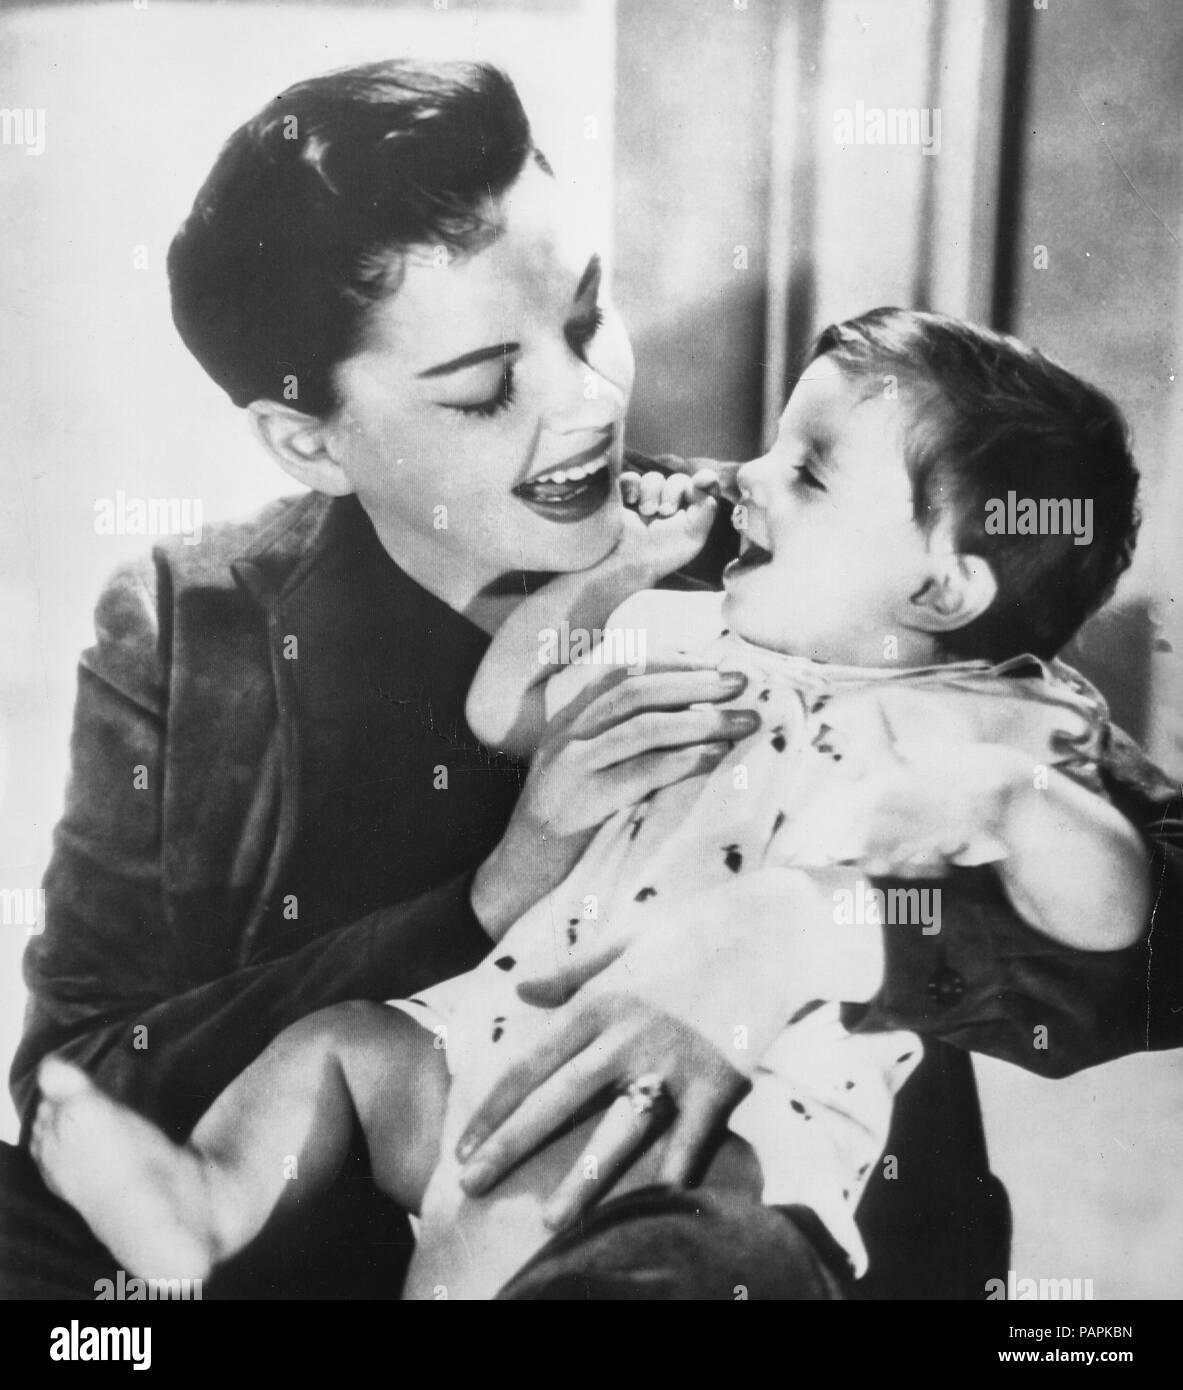 judy garland with son joseph, hollywood, los angeles, california, 1956 - Stock Image